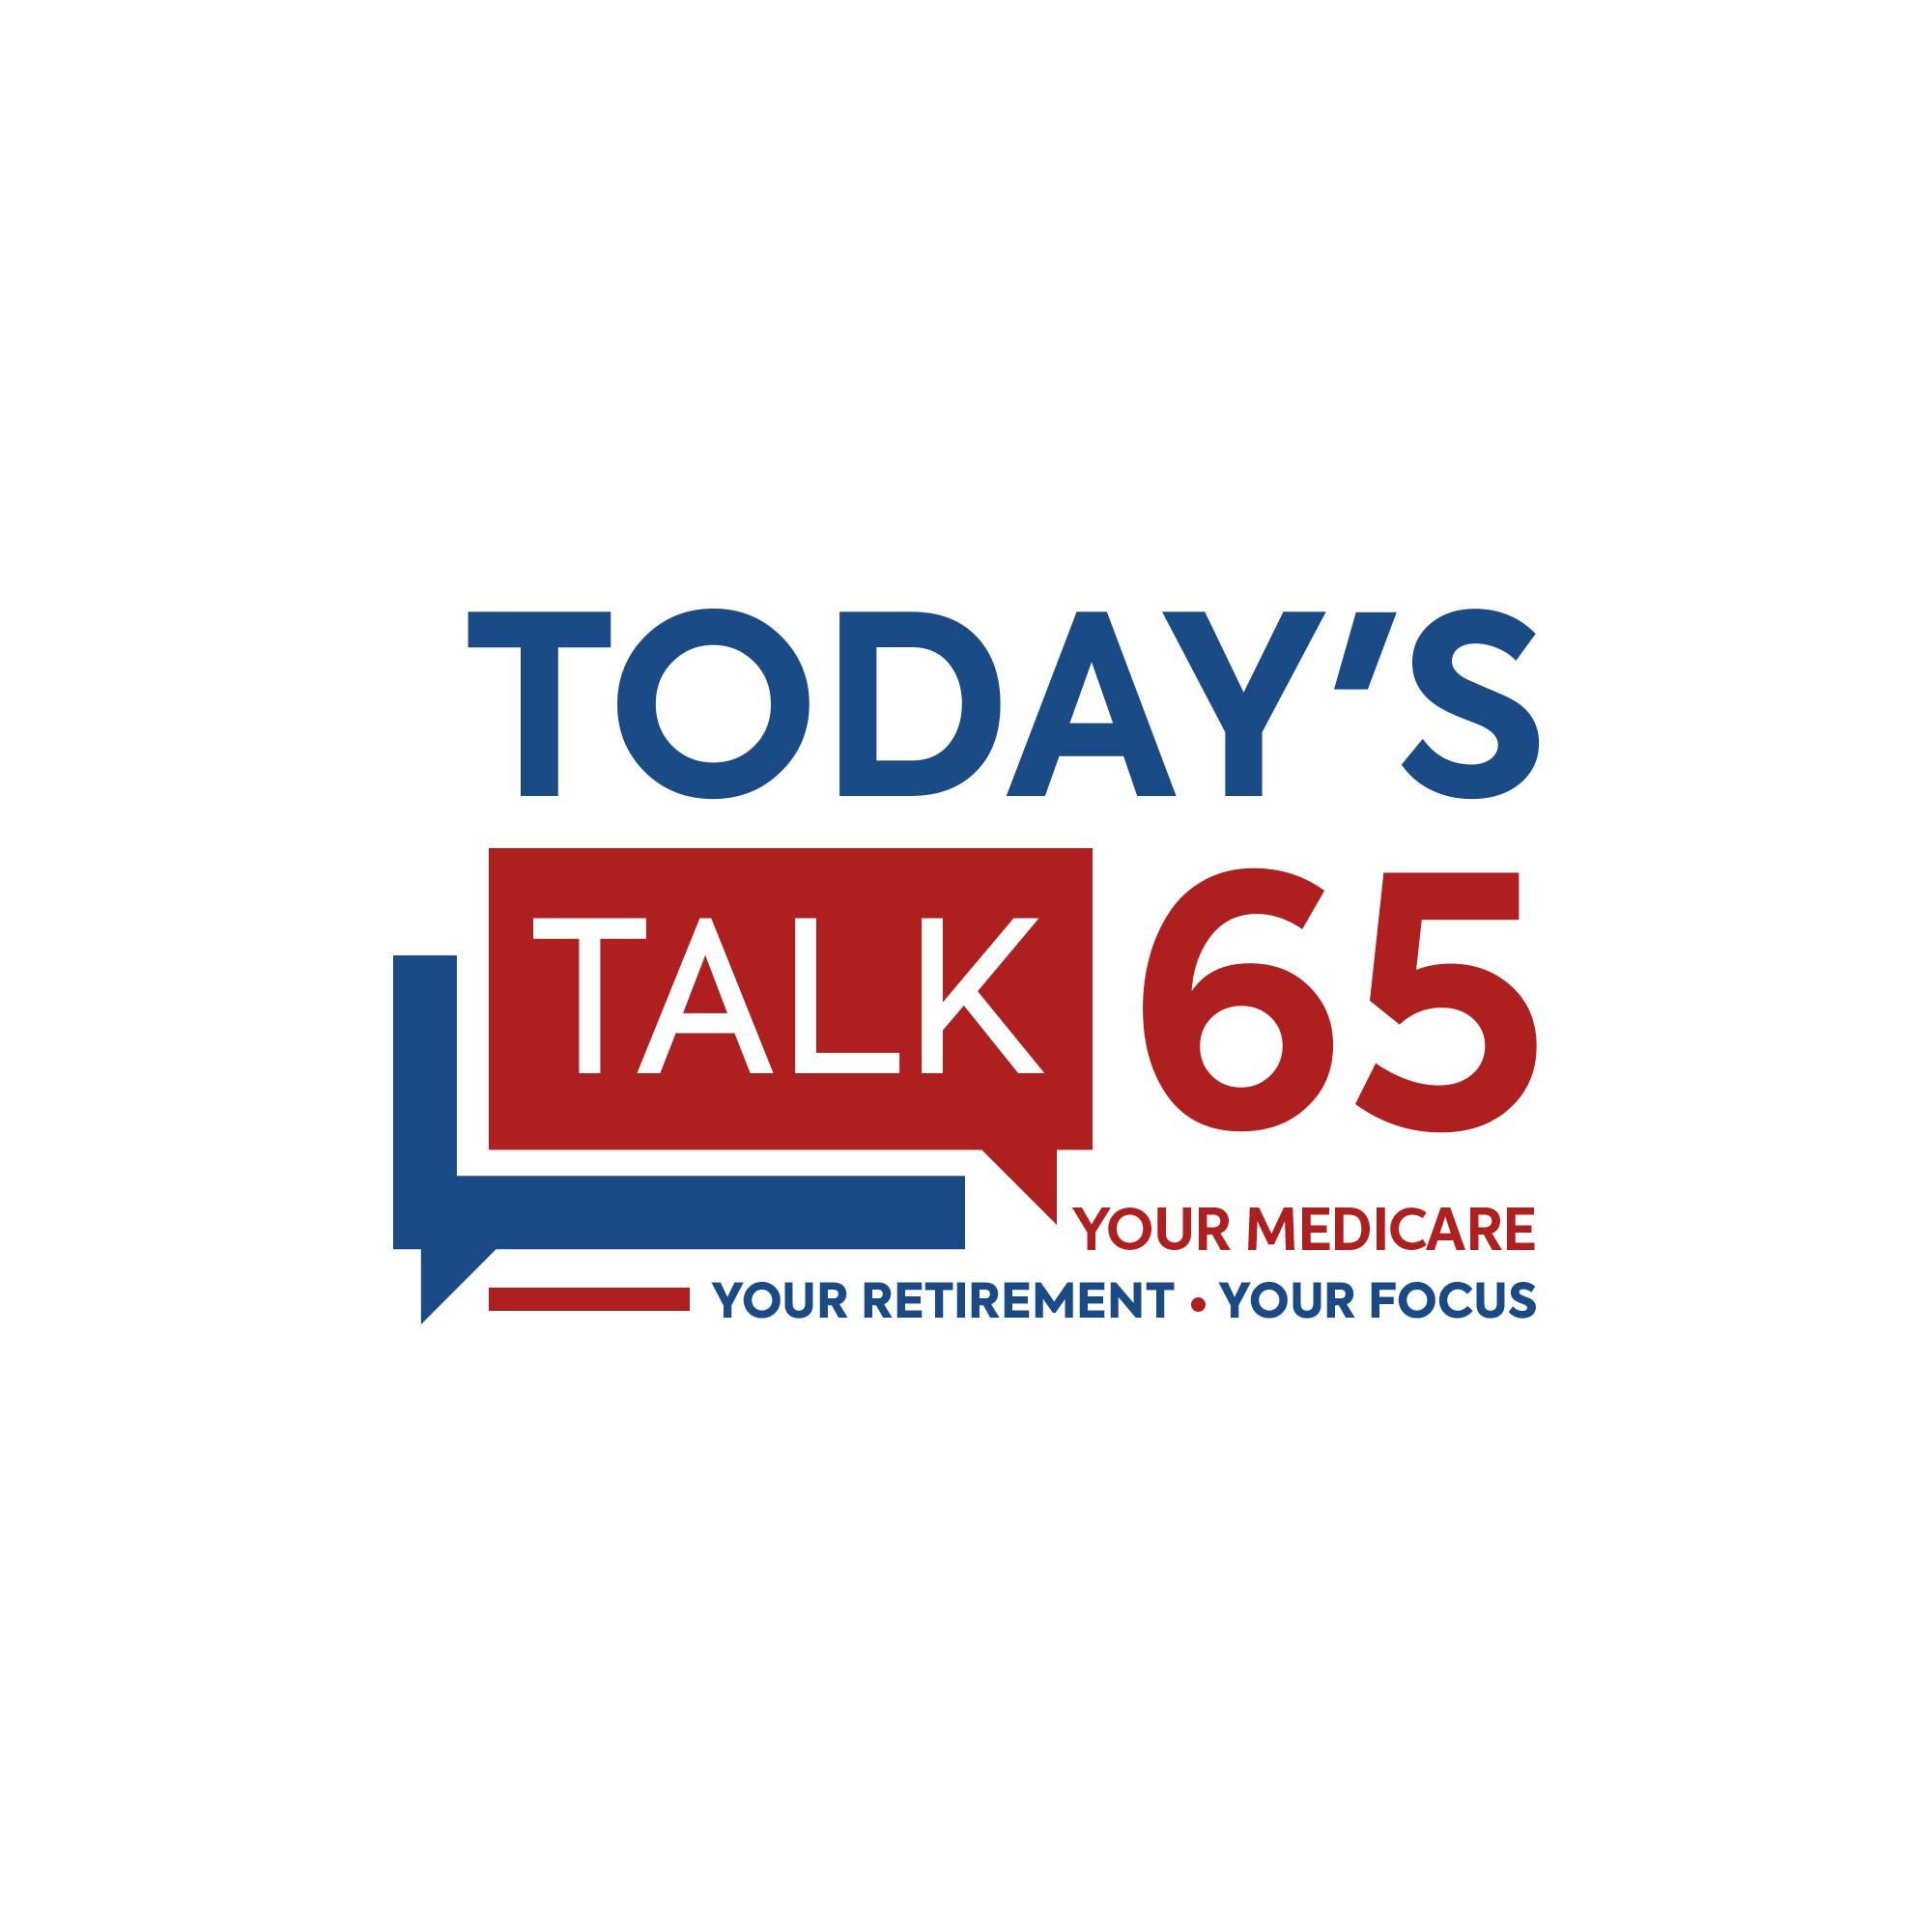 Today's Talk 65